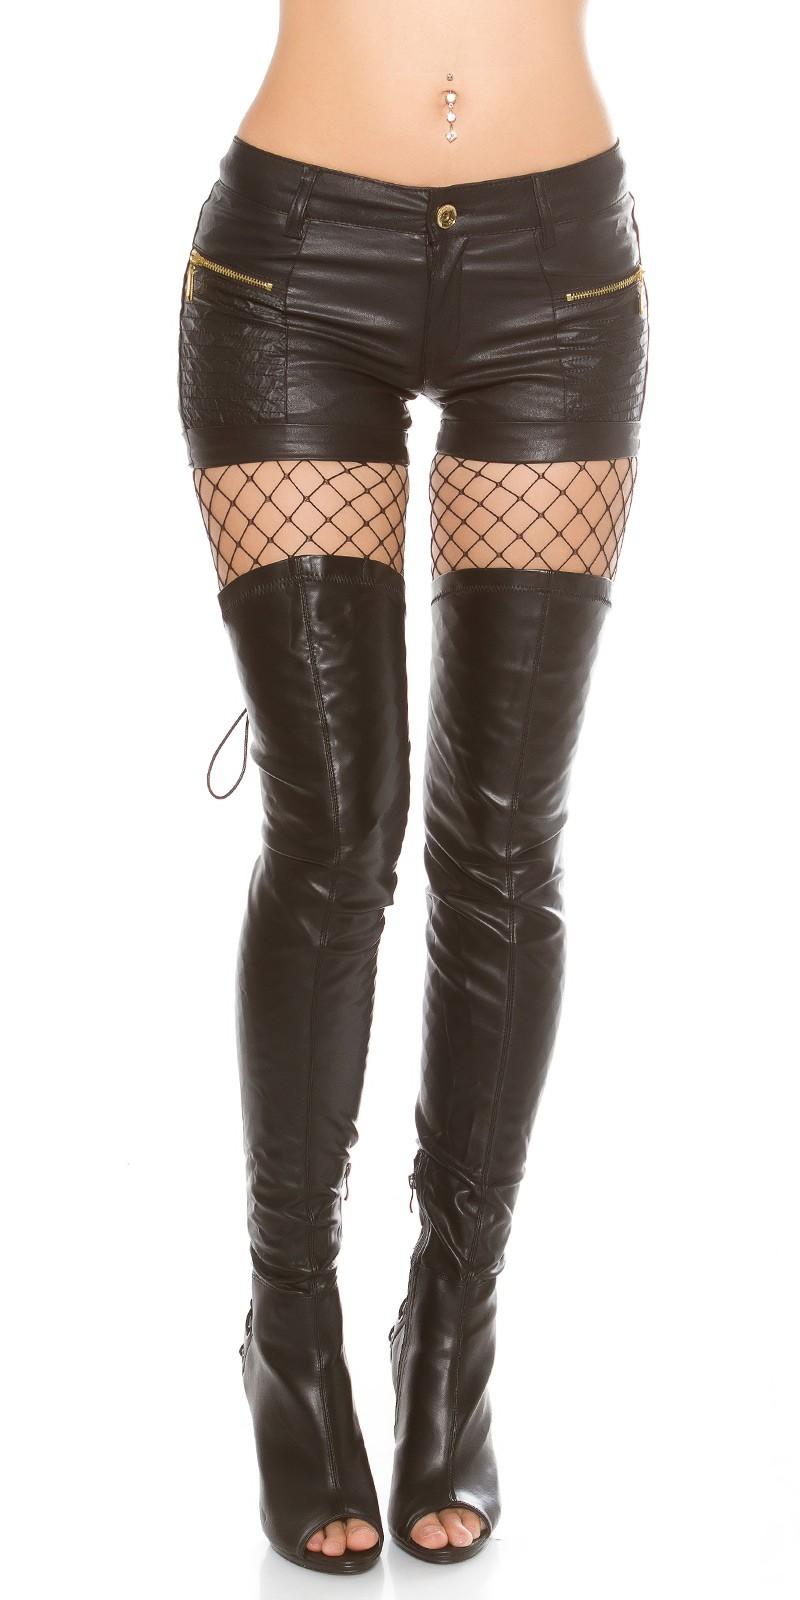 eeleather_look_hot_pants_with_zips__color_black_size_xl_0000j472-1_schwarz_3